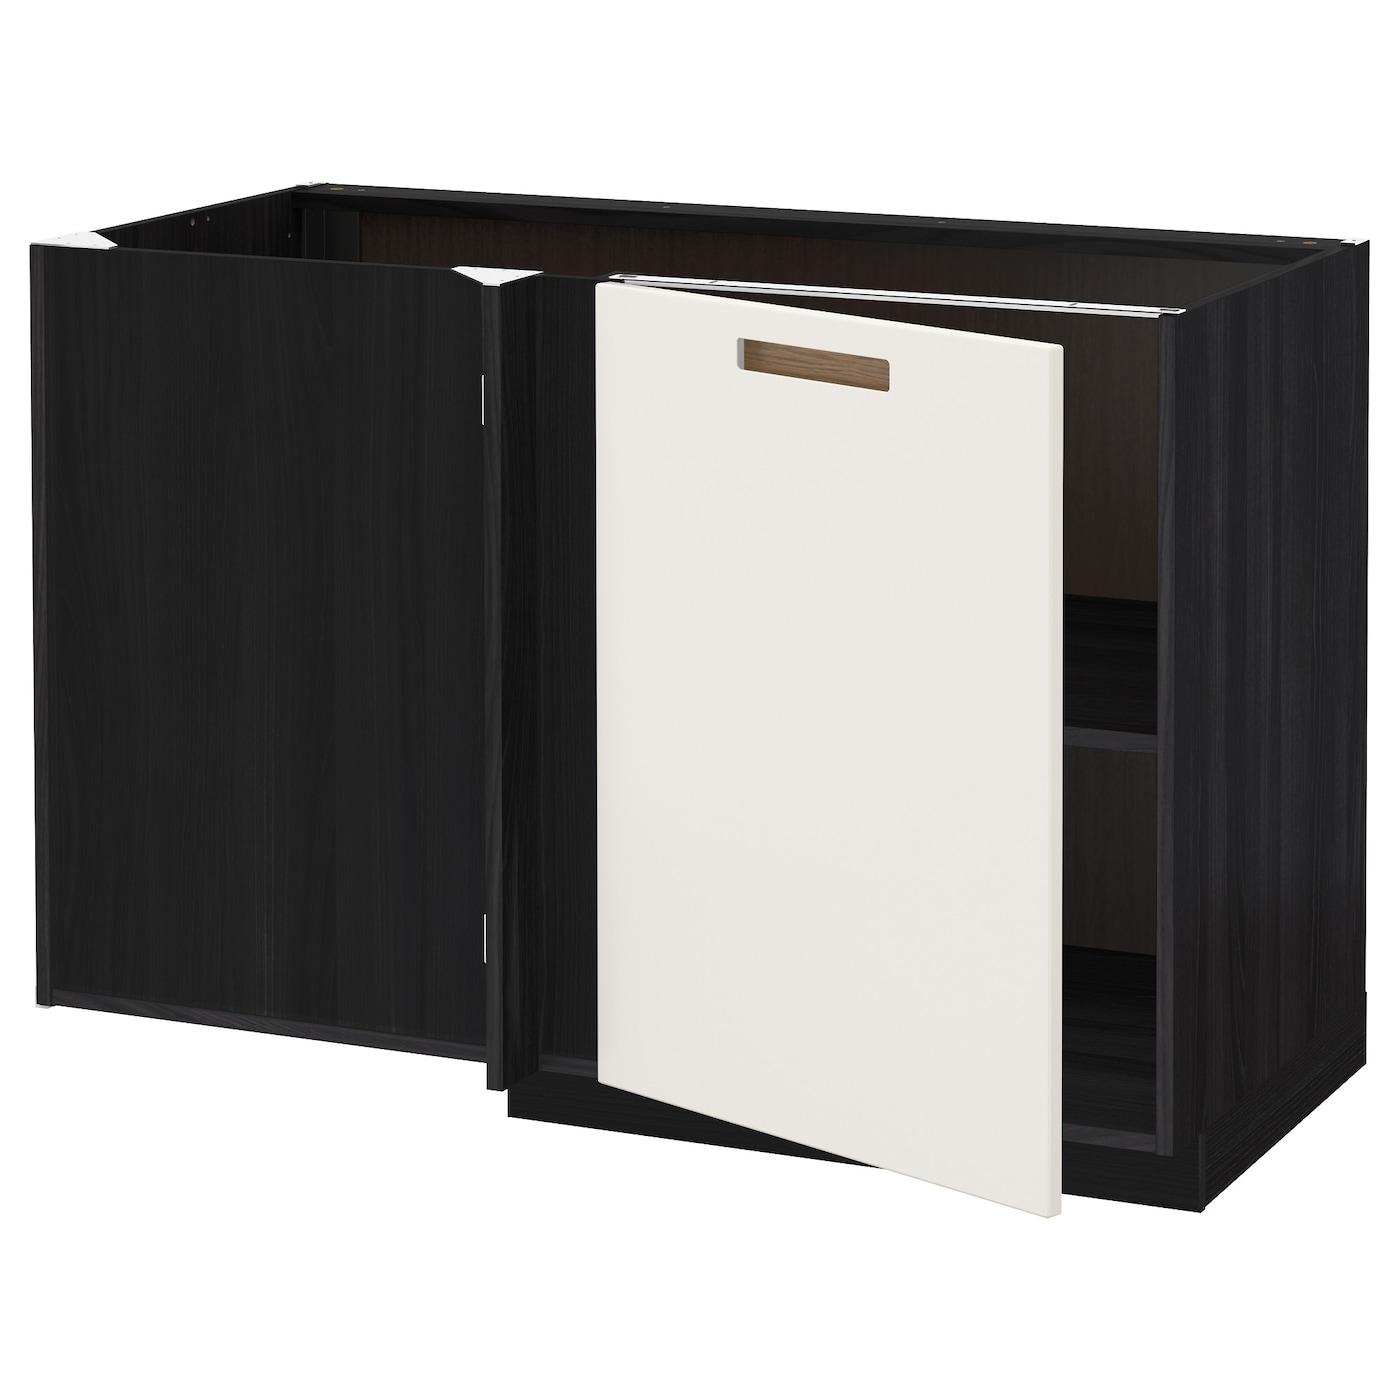 METOD Corner base cabinet with shelf Black märsta white